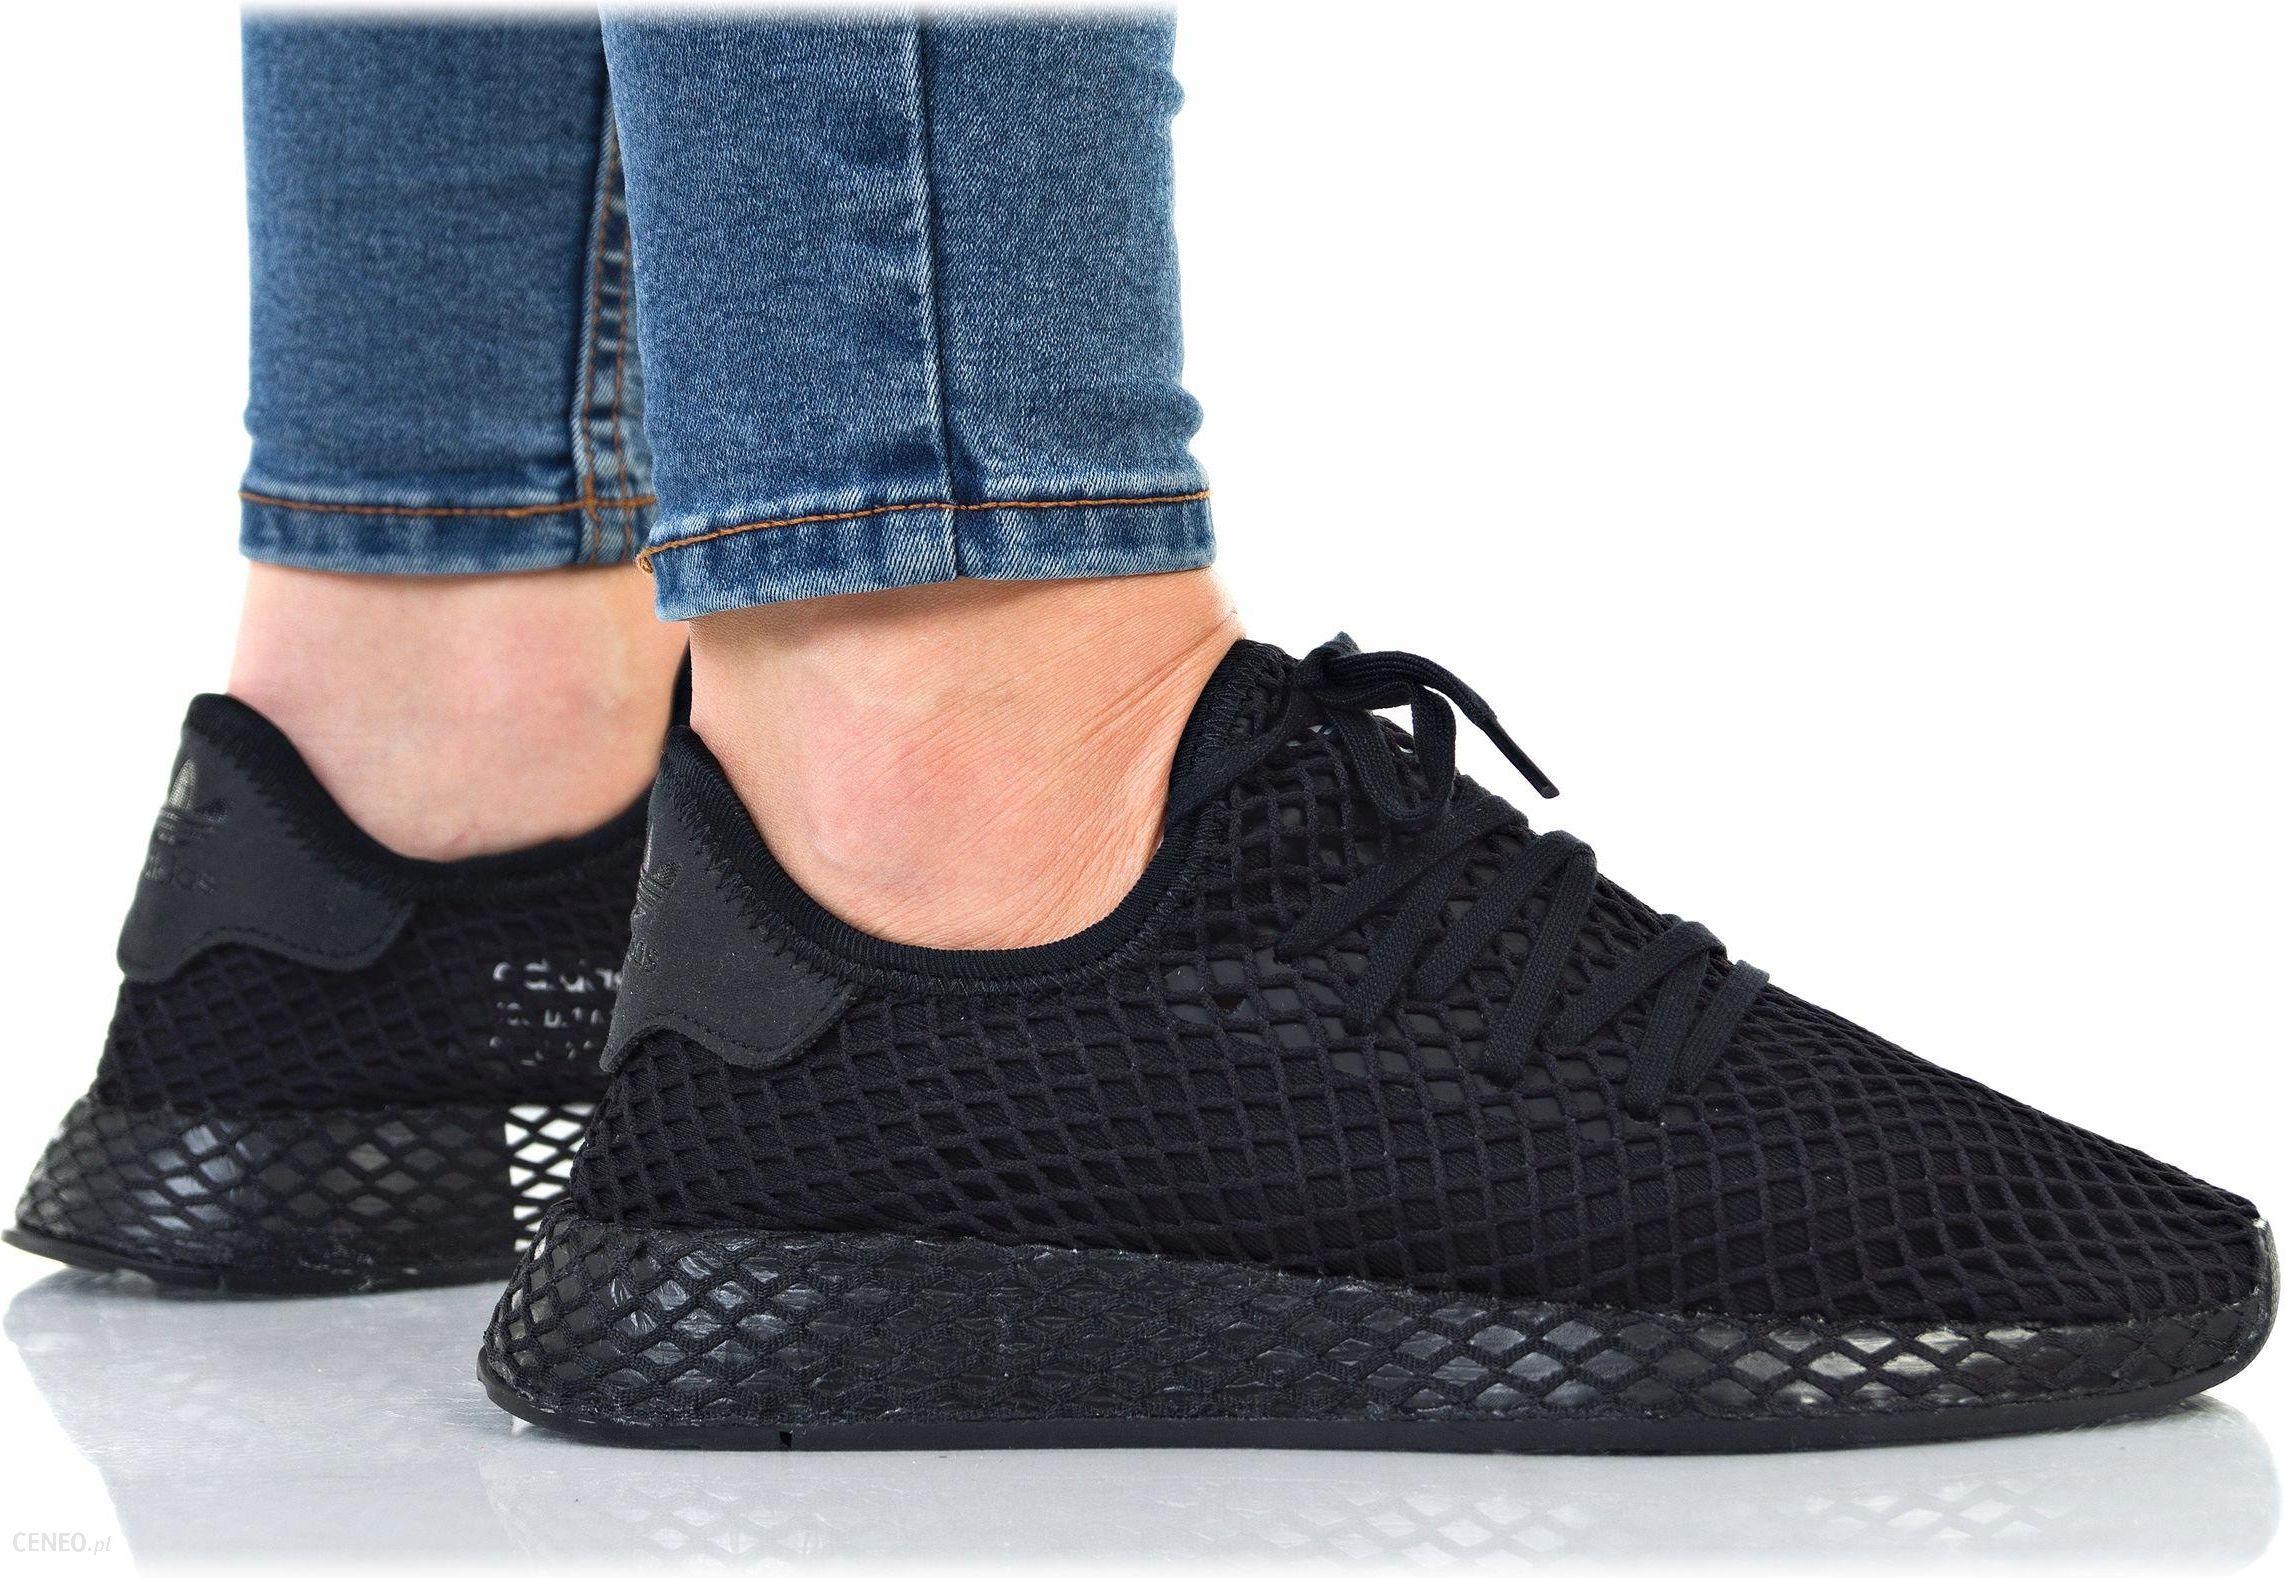 Buty Adidas Damskie Deerupt Runner J B41877 Czarne - Ceny i opinie -  Ceneo.pl